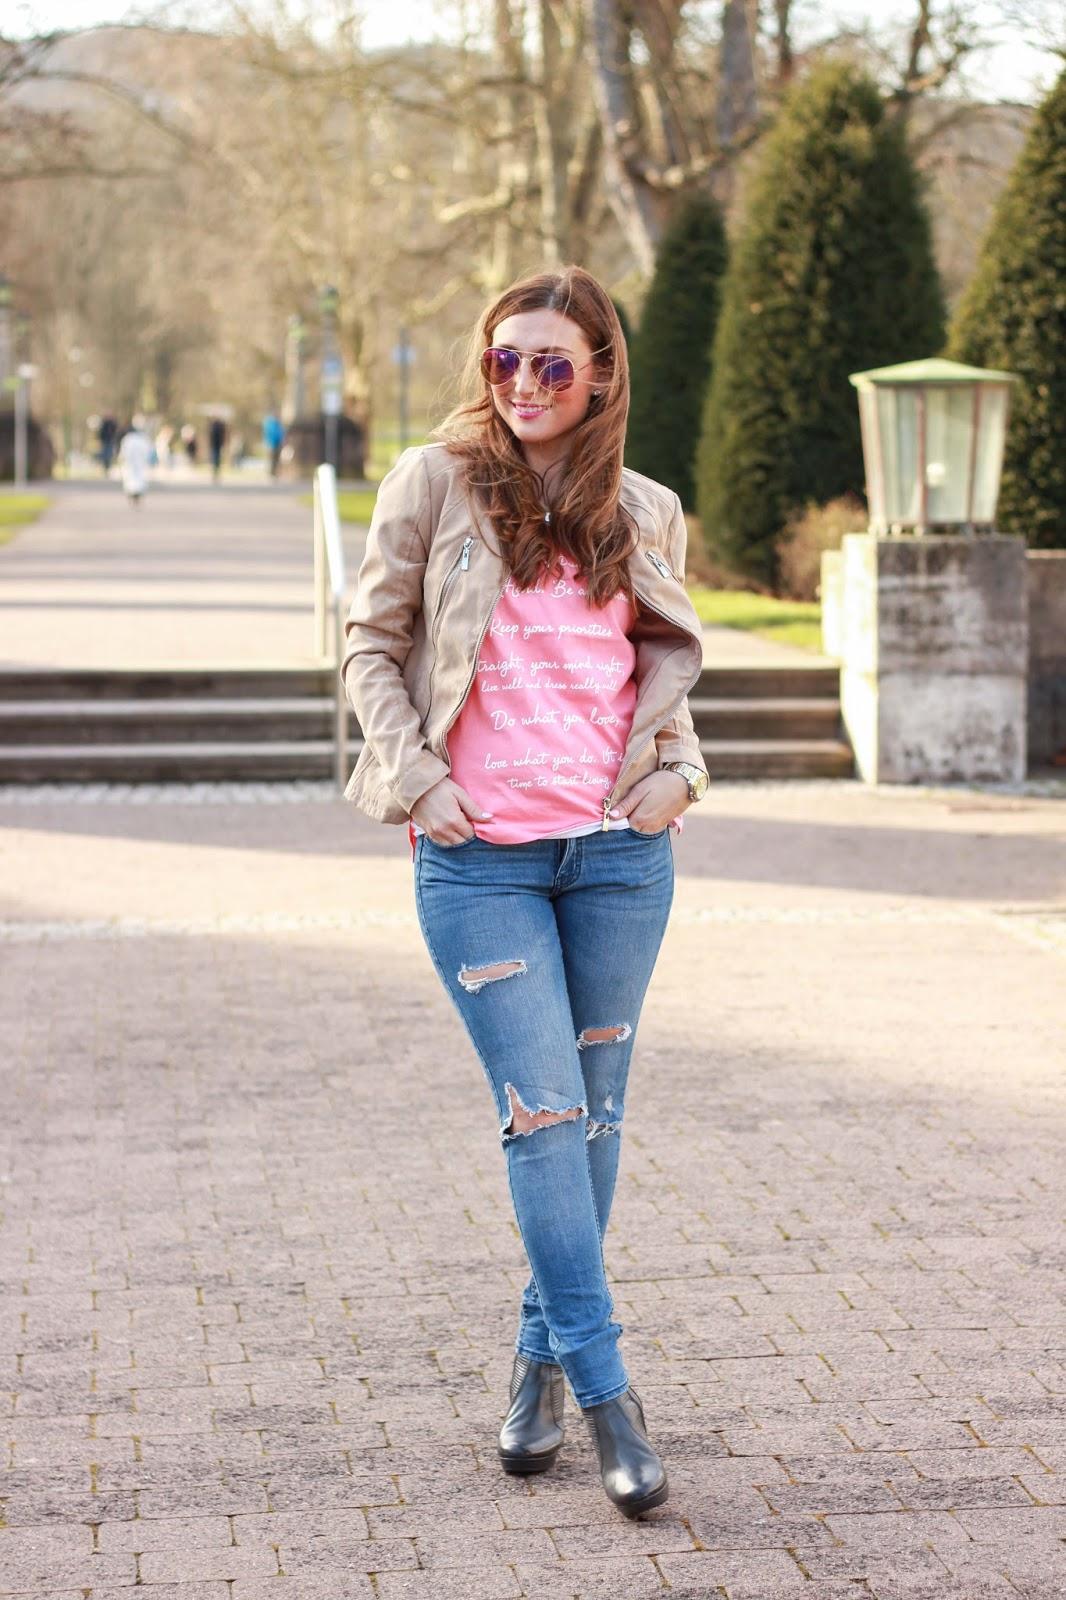 Fashionblogger aus Frankfurt - Frankfurt Blogger - German Fashionblogger - Fashionblog - Weiße Hose - Weiße Jeans - Streetstyleinspiration